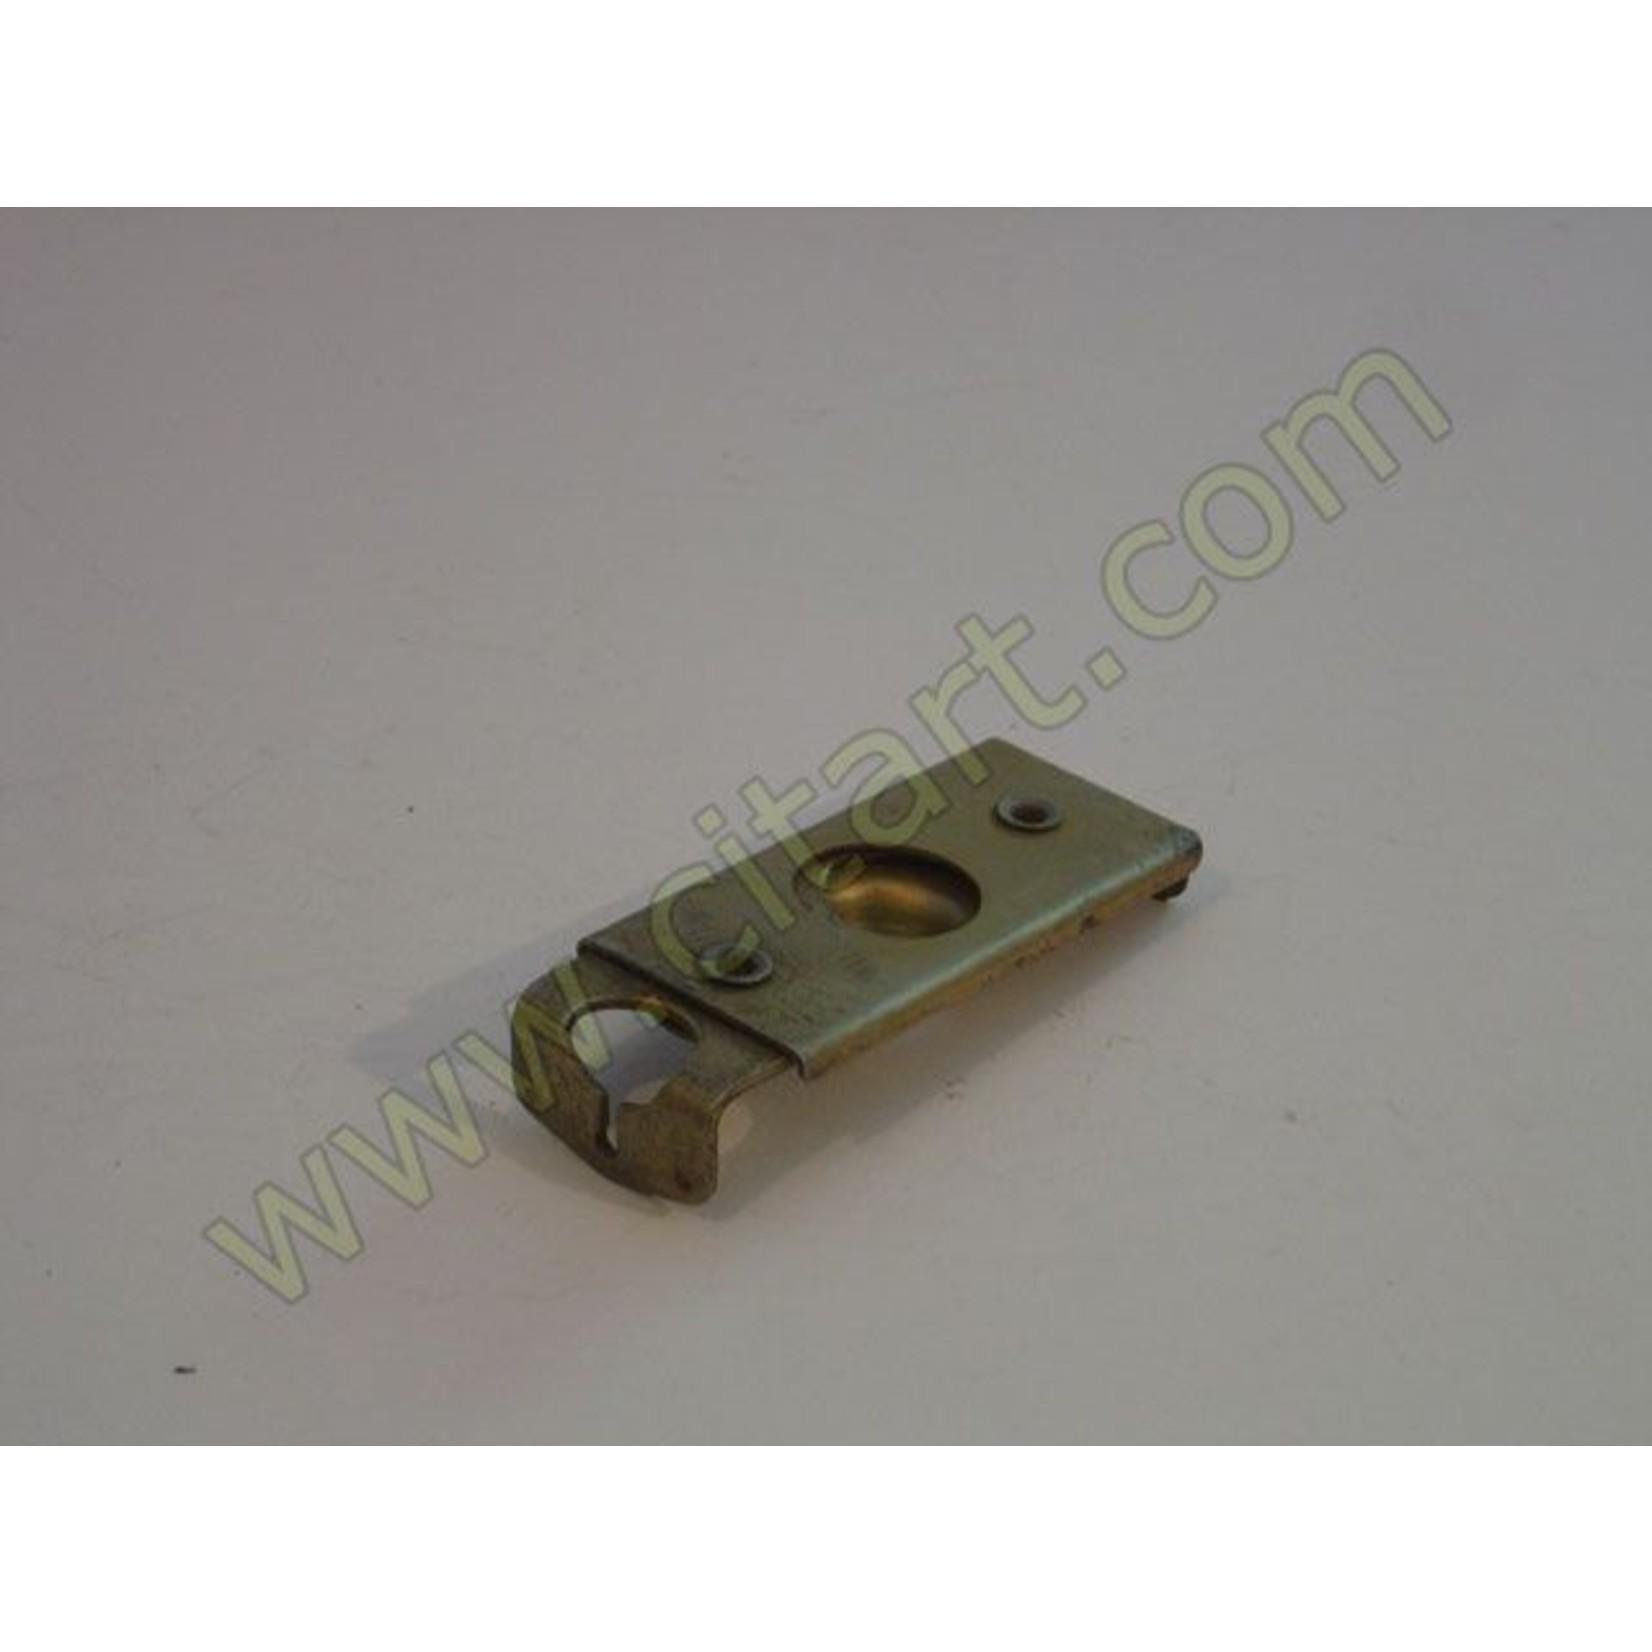 Lock with spring bonnet -68 Nr Org: D86137